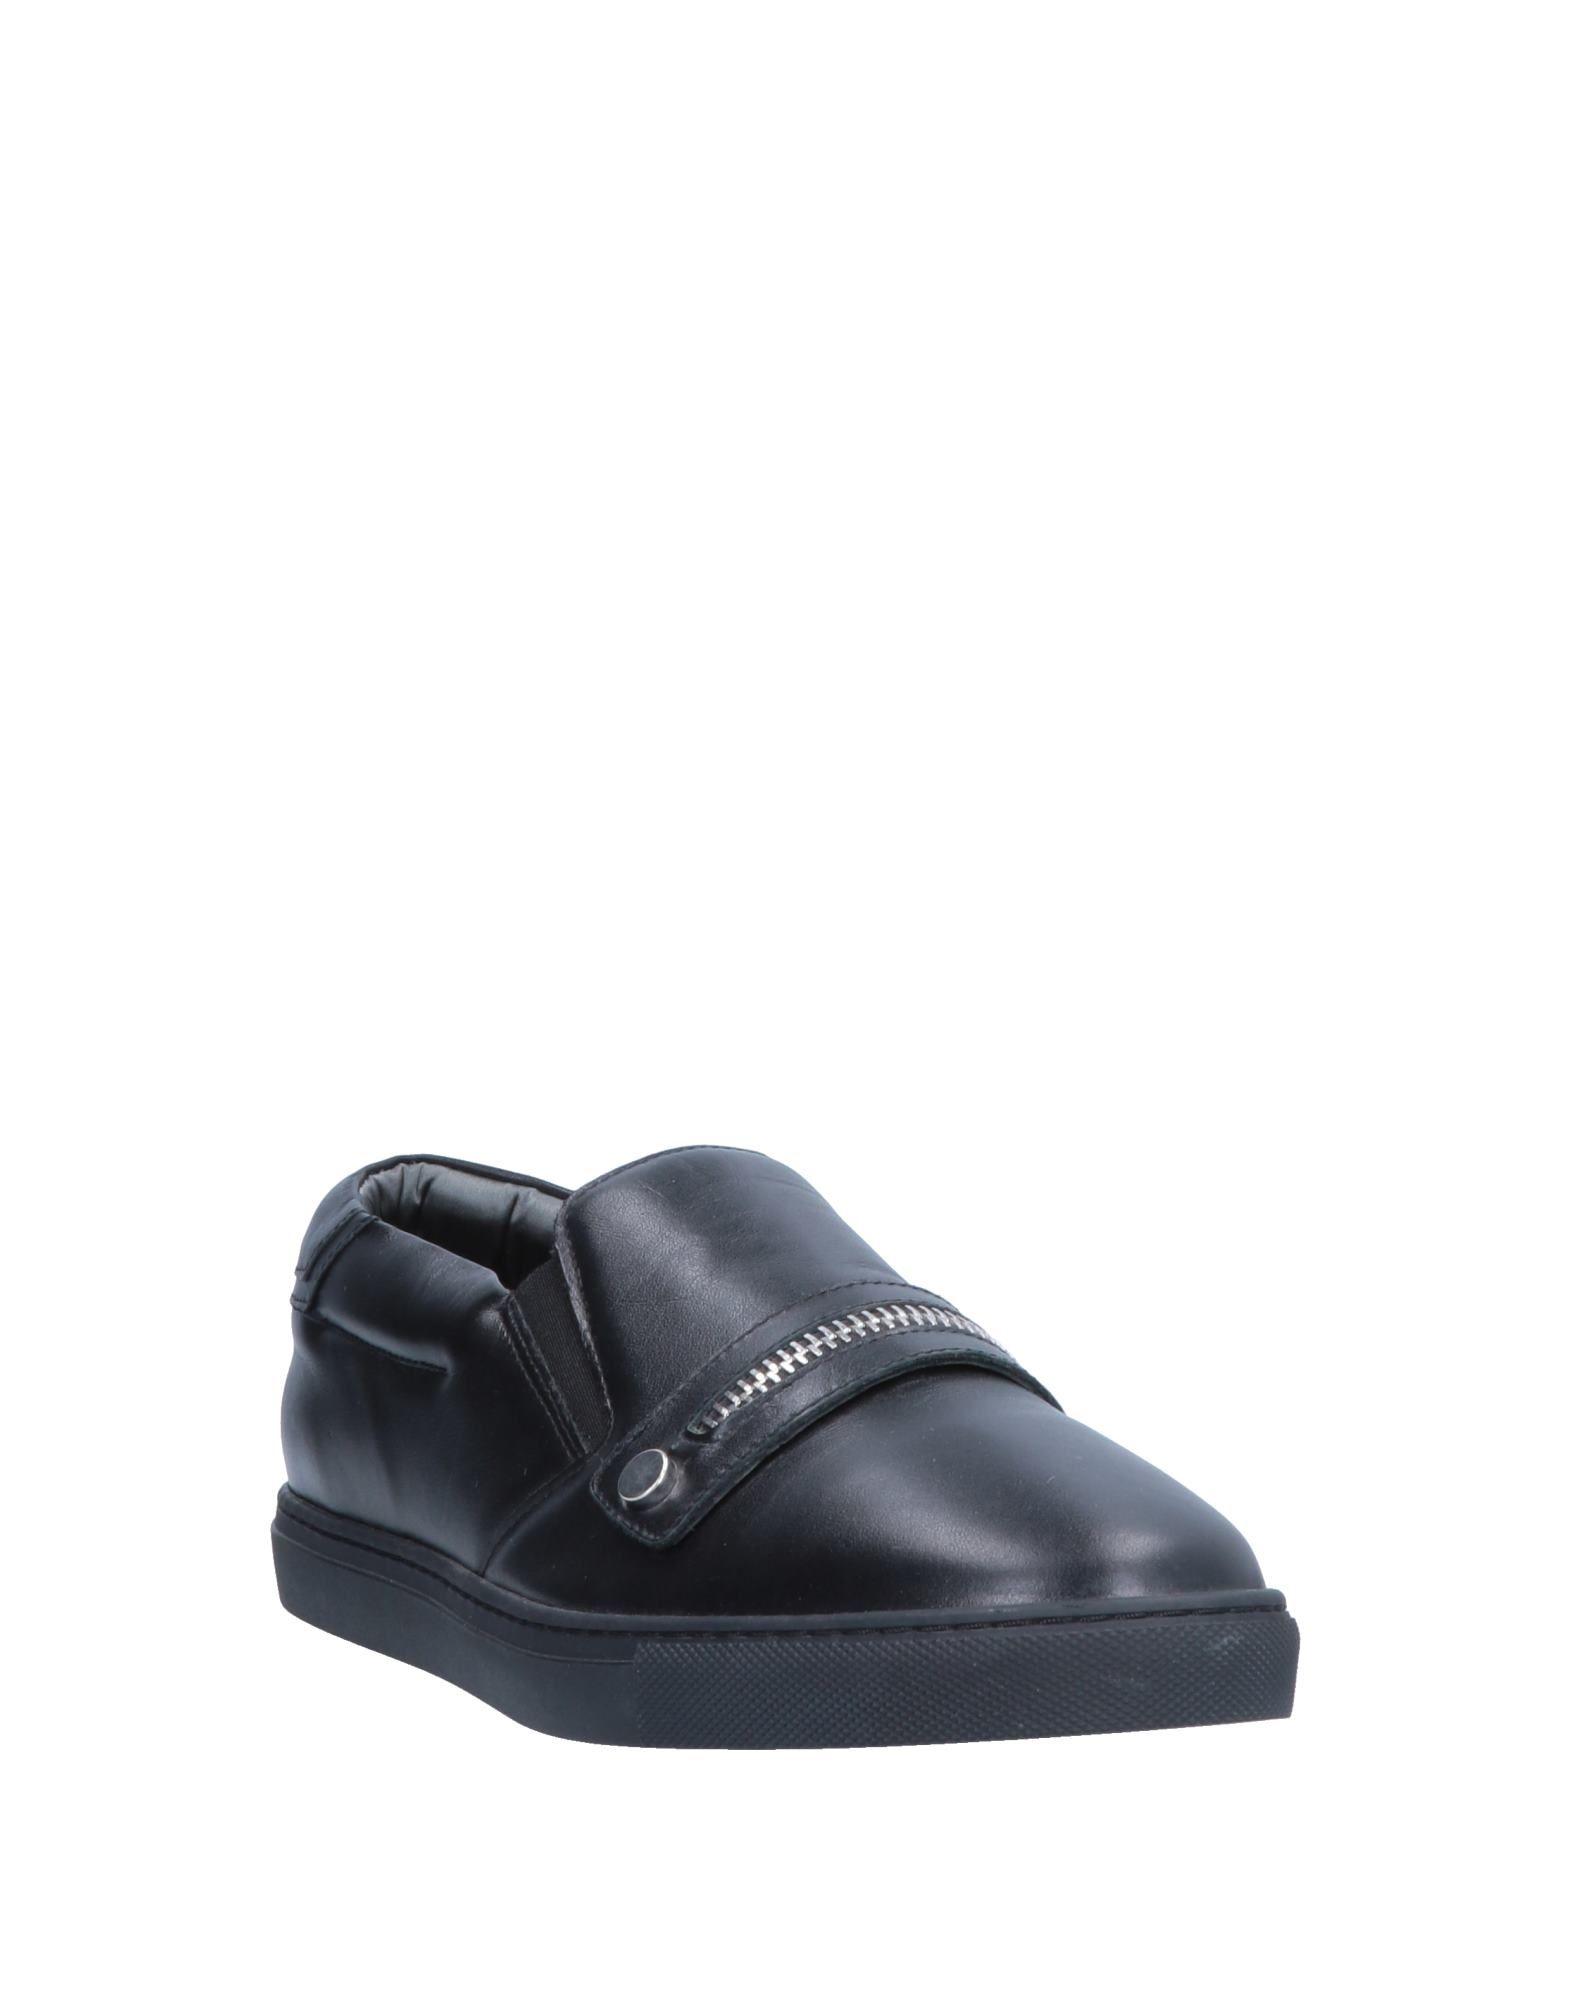 Sneakers Just Just Just Cavalli Uomo - 11560113BK ad151d